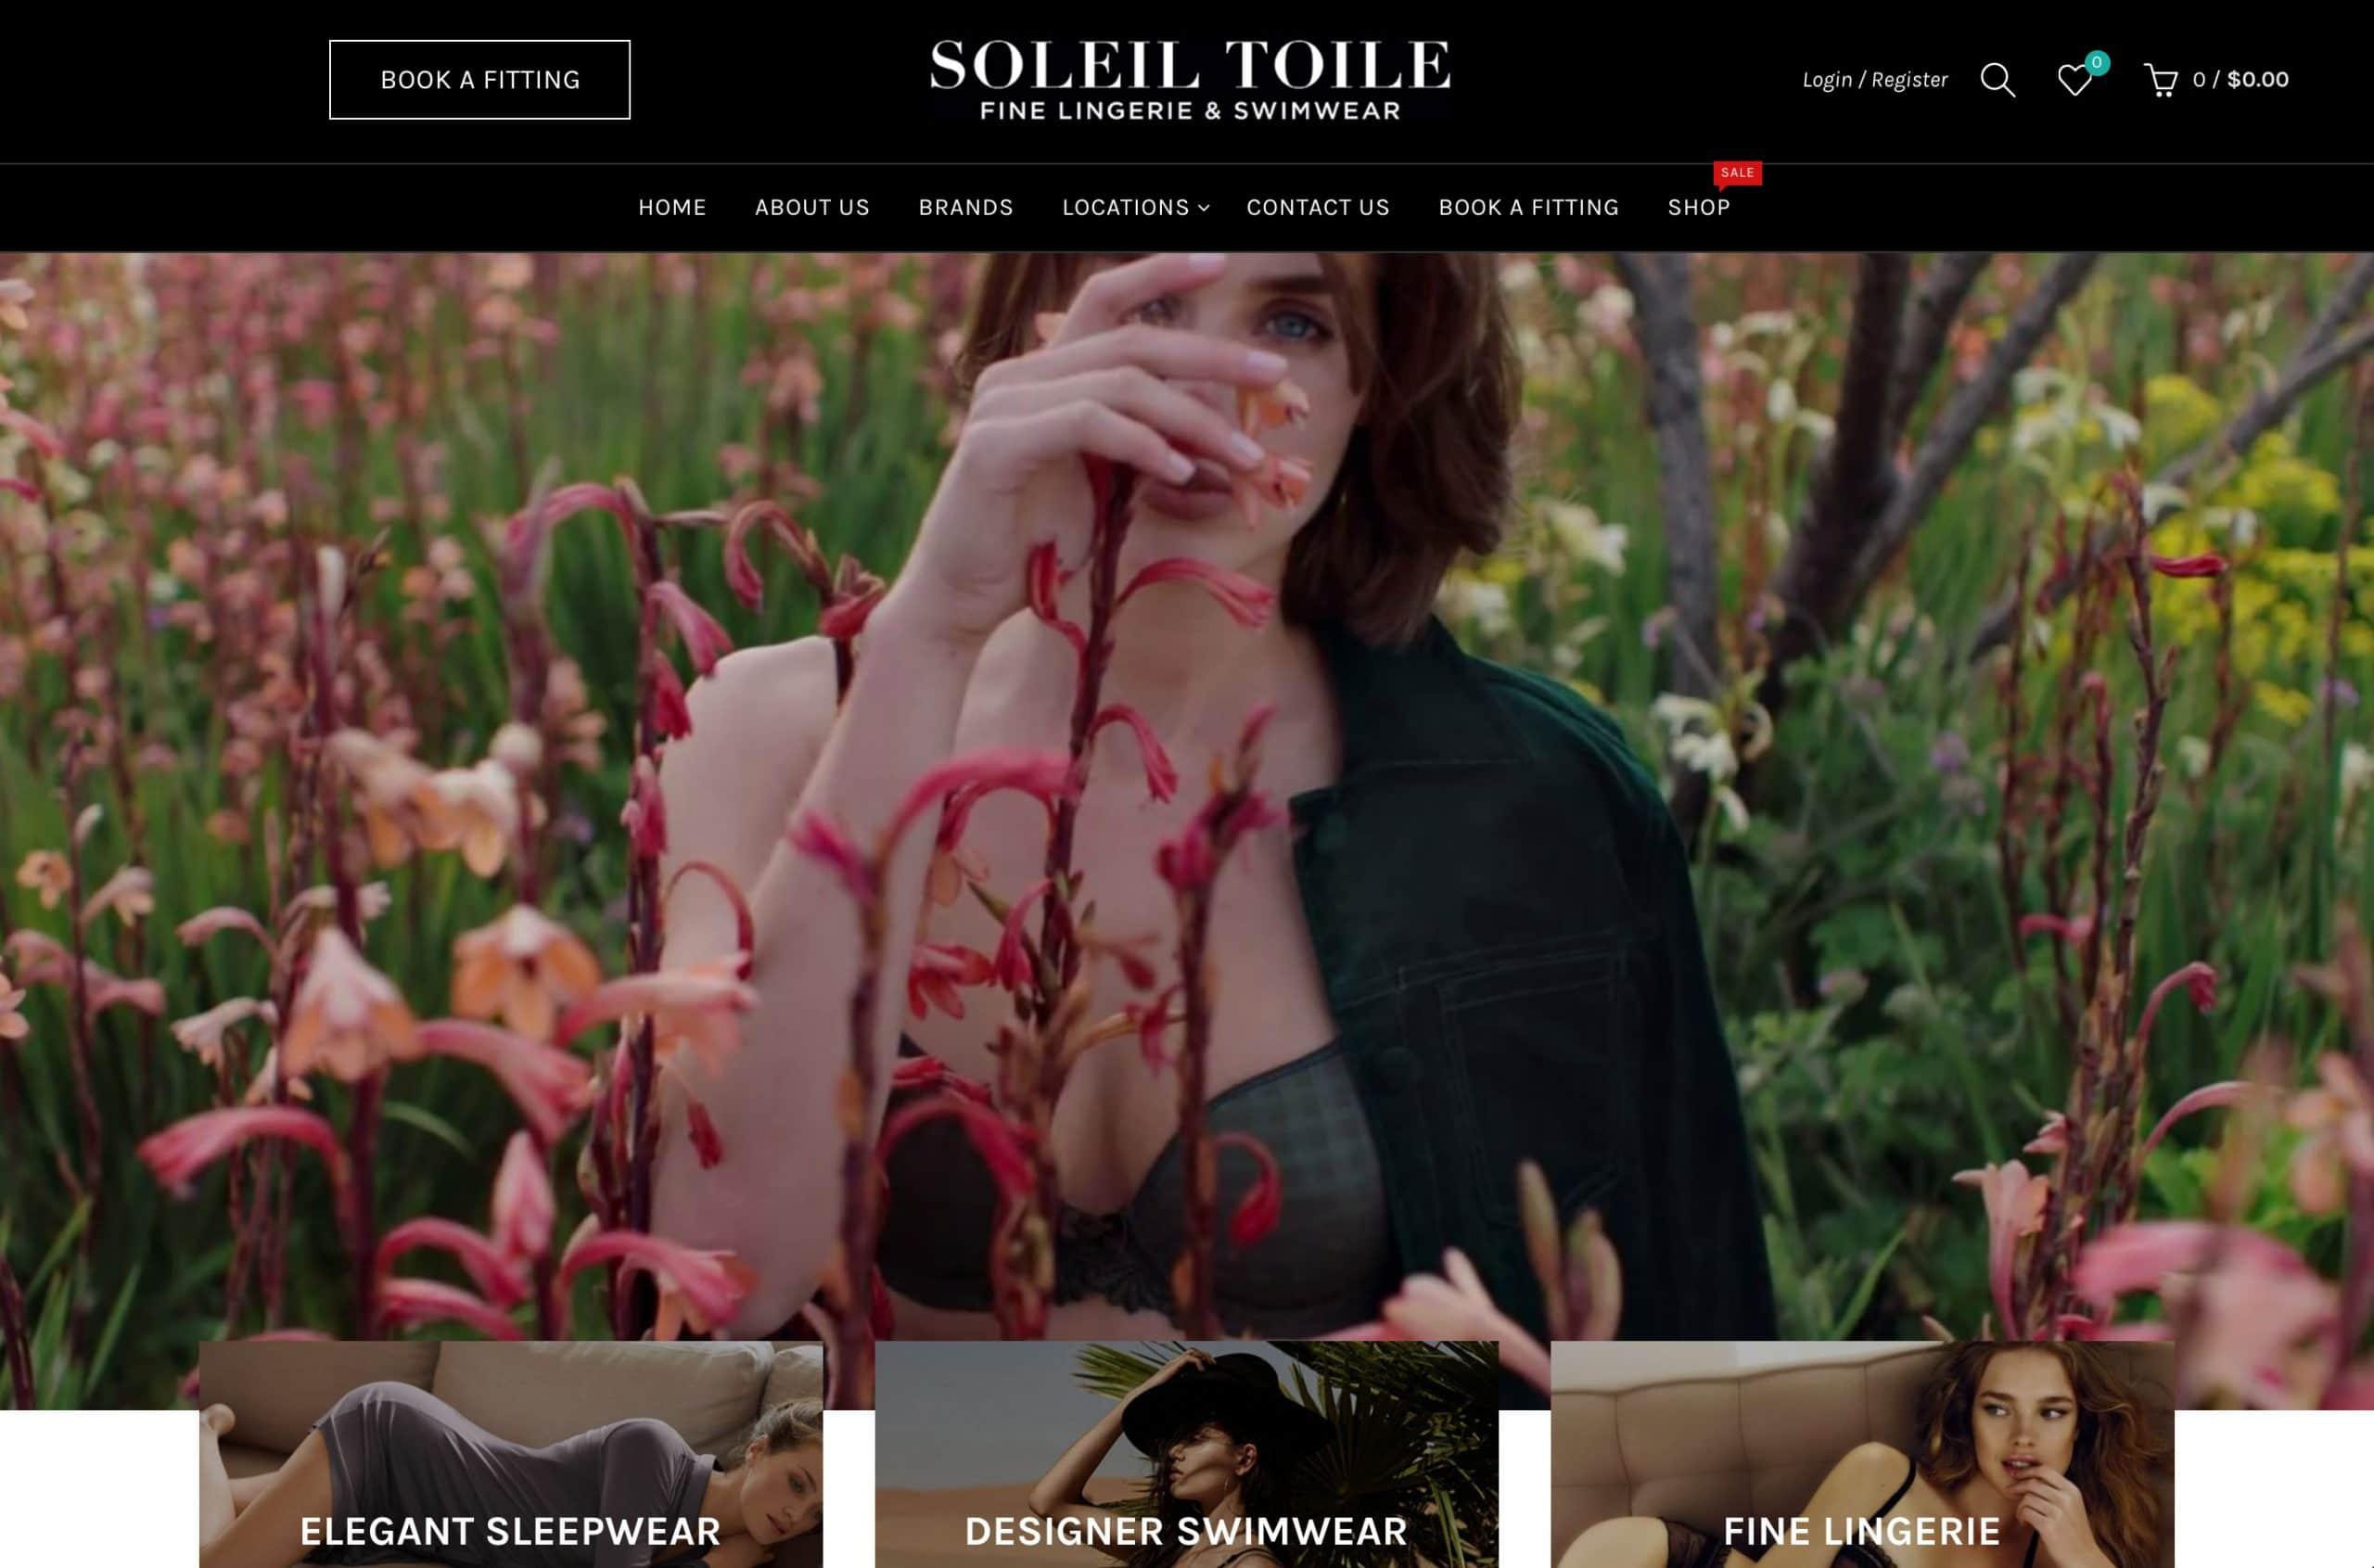 Soleil Toile Website